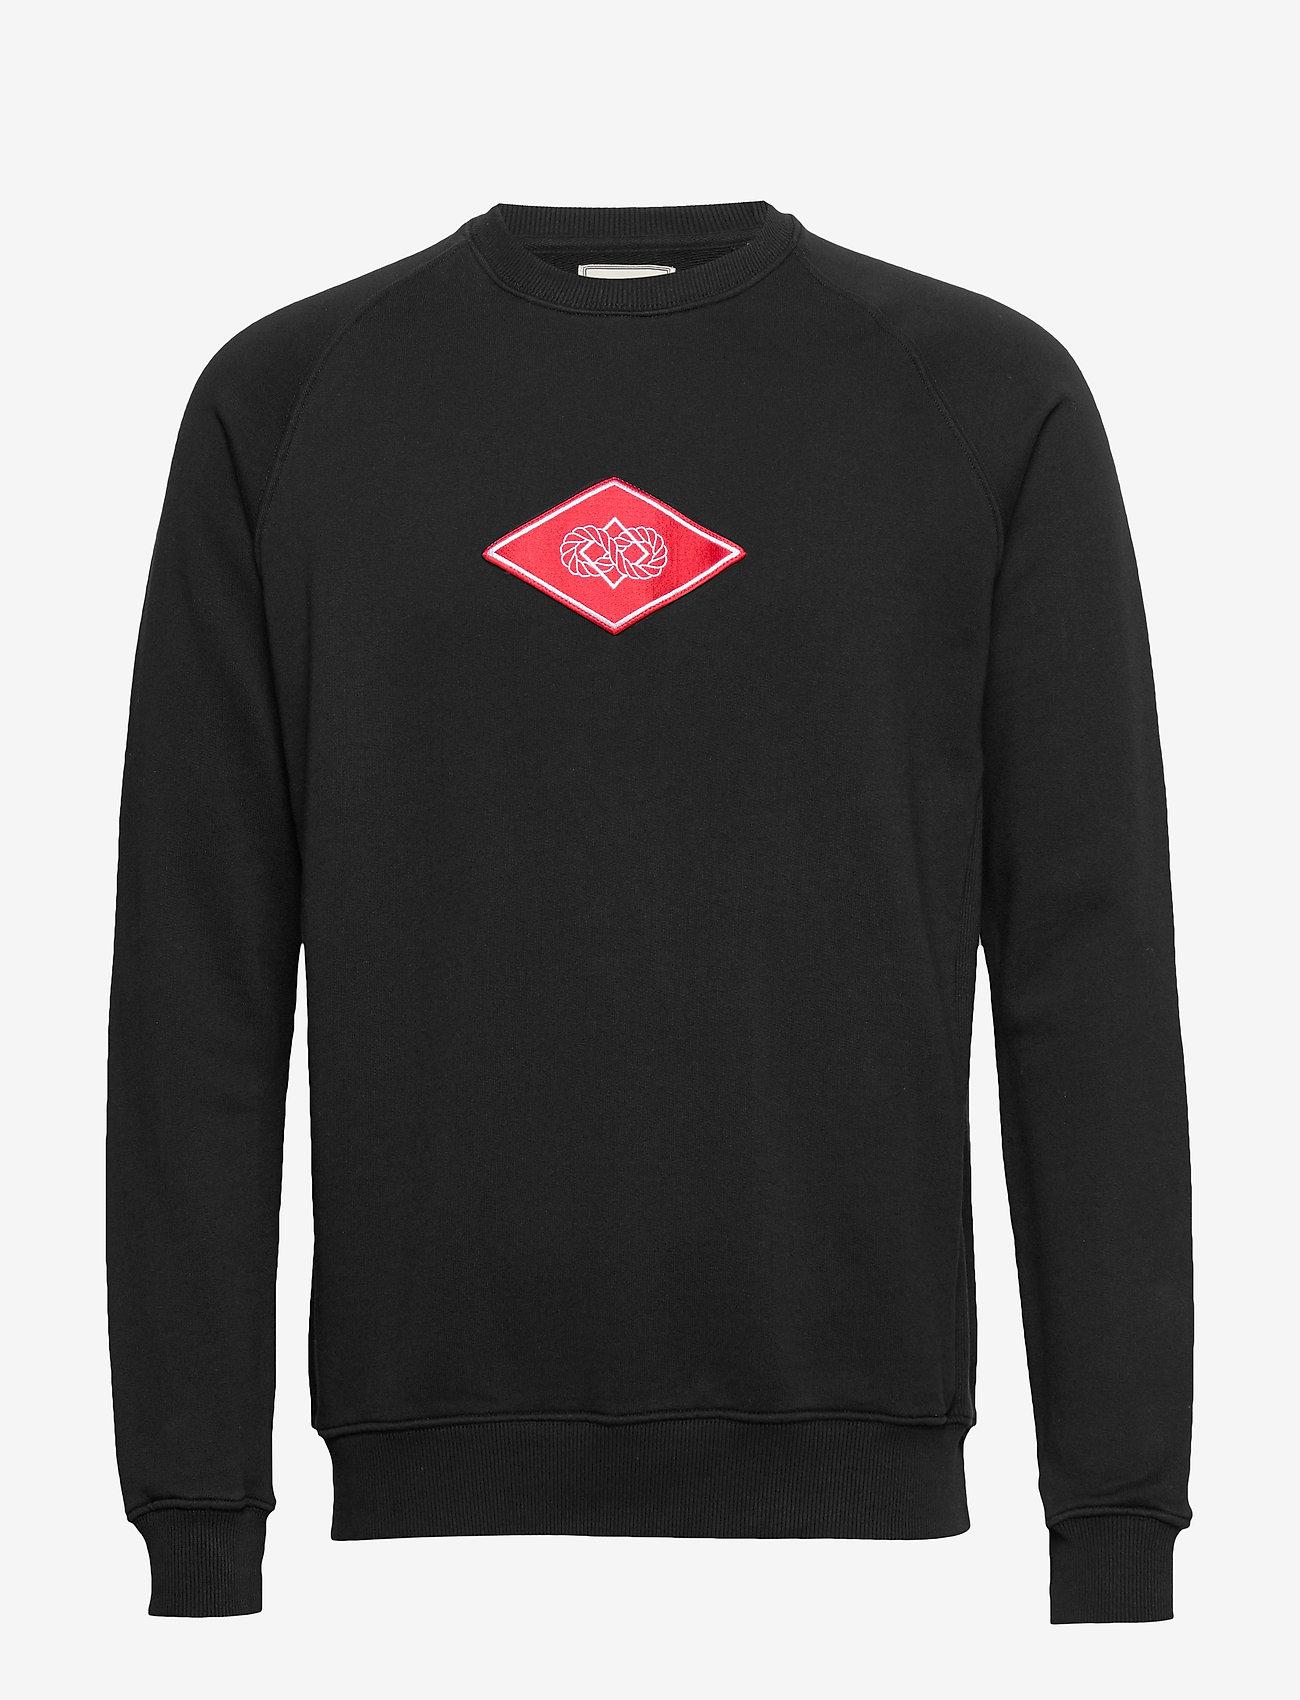 Forét - KNOT SWEATSHIRT - BLACK - basic-sweatshirts - black - 0